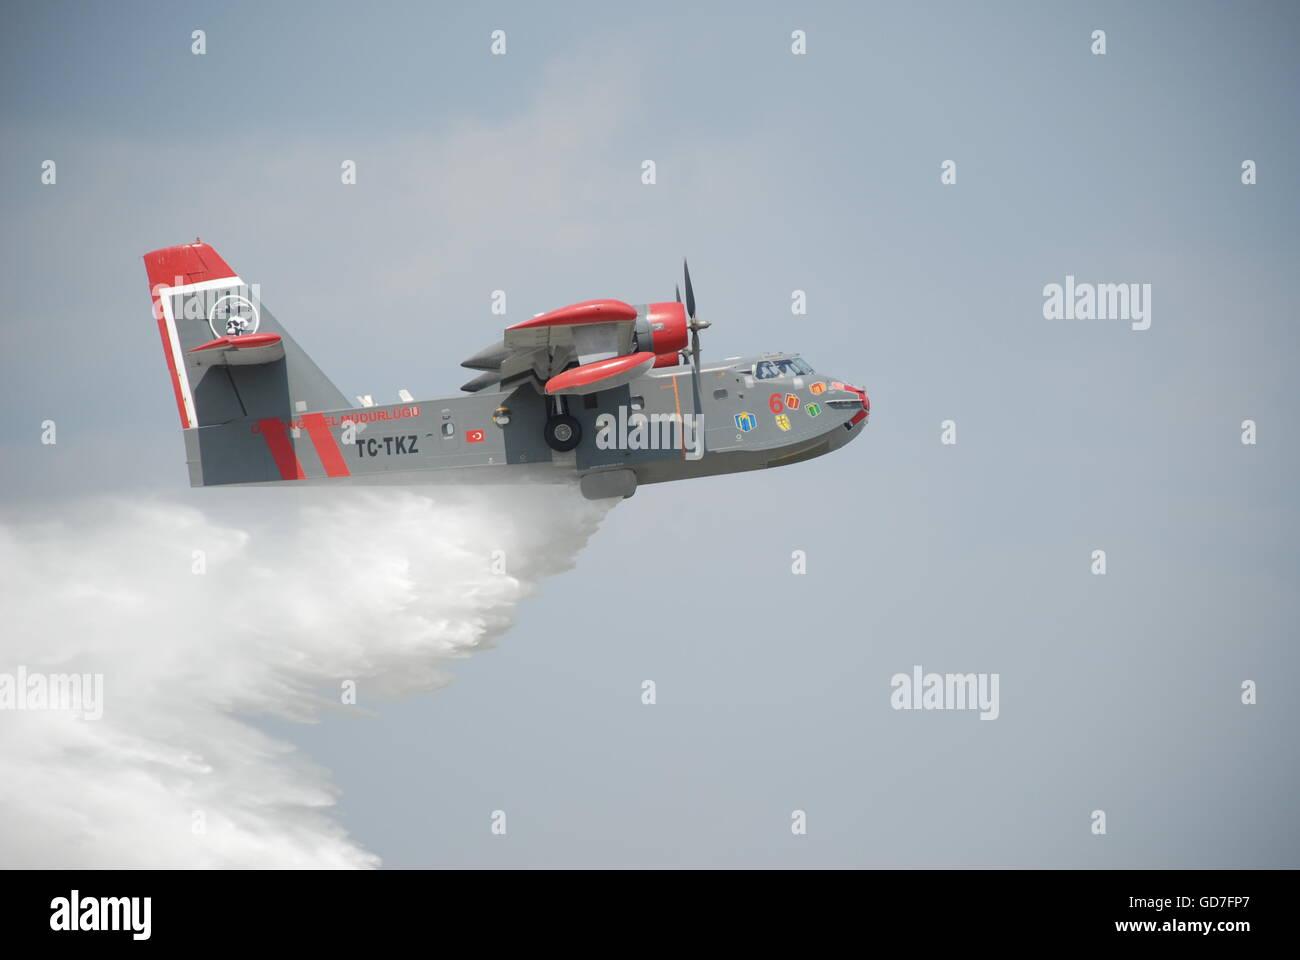 Piston Engine Aircraft Stock Photos & Piston Engine Aircraft Stock